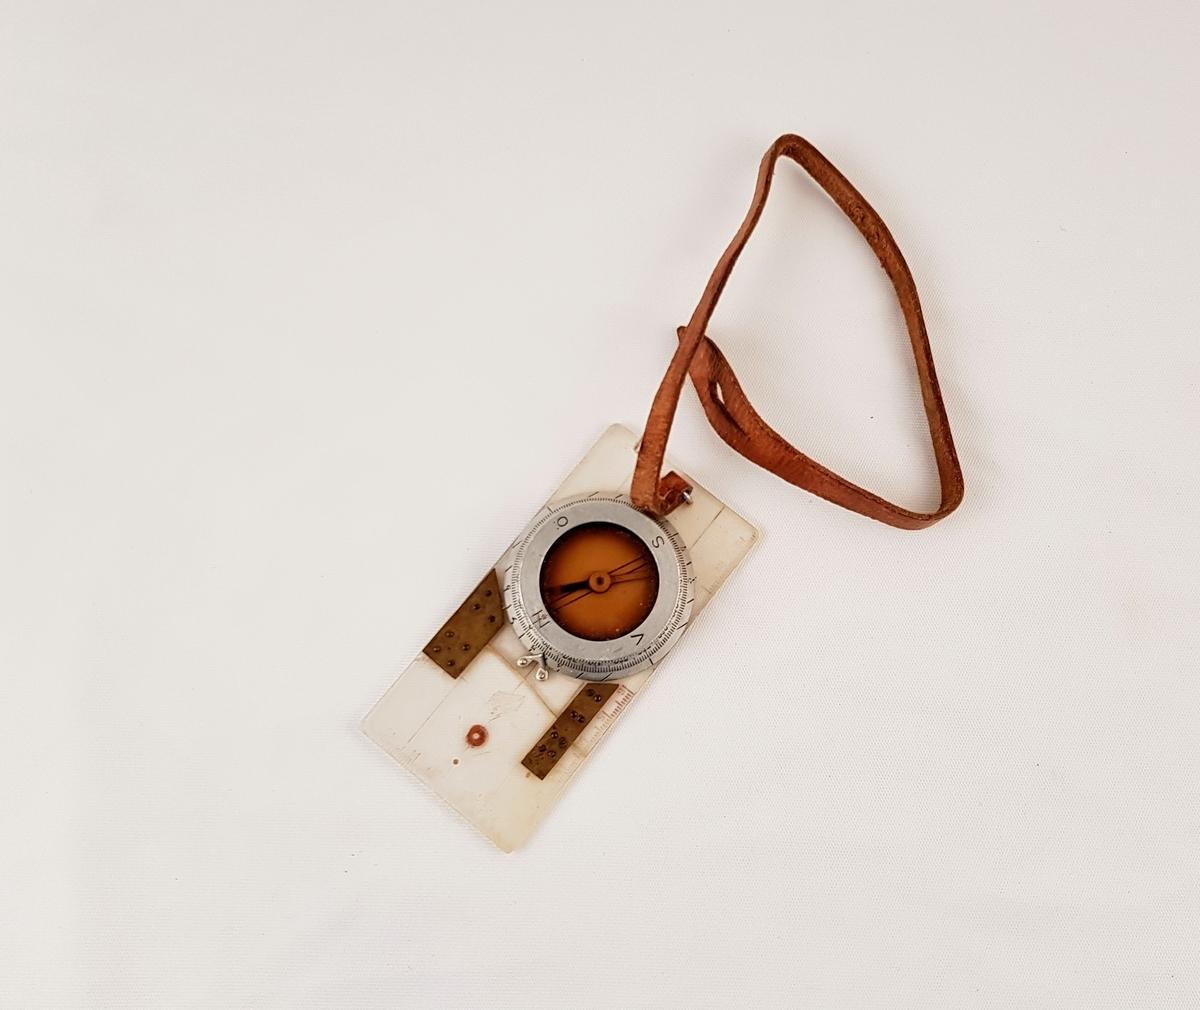 Silva turkompass i plast og metall med lærreim.